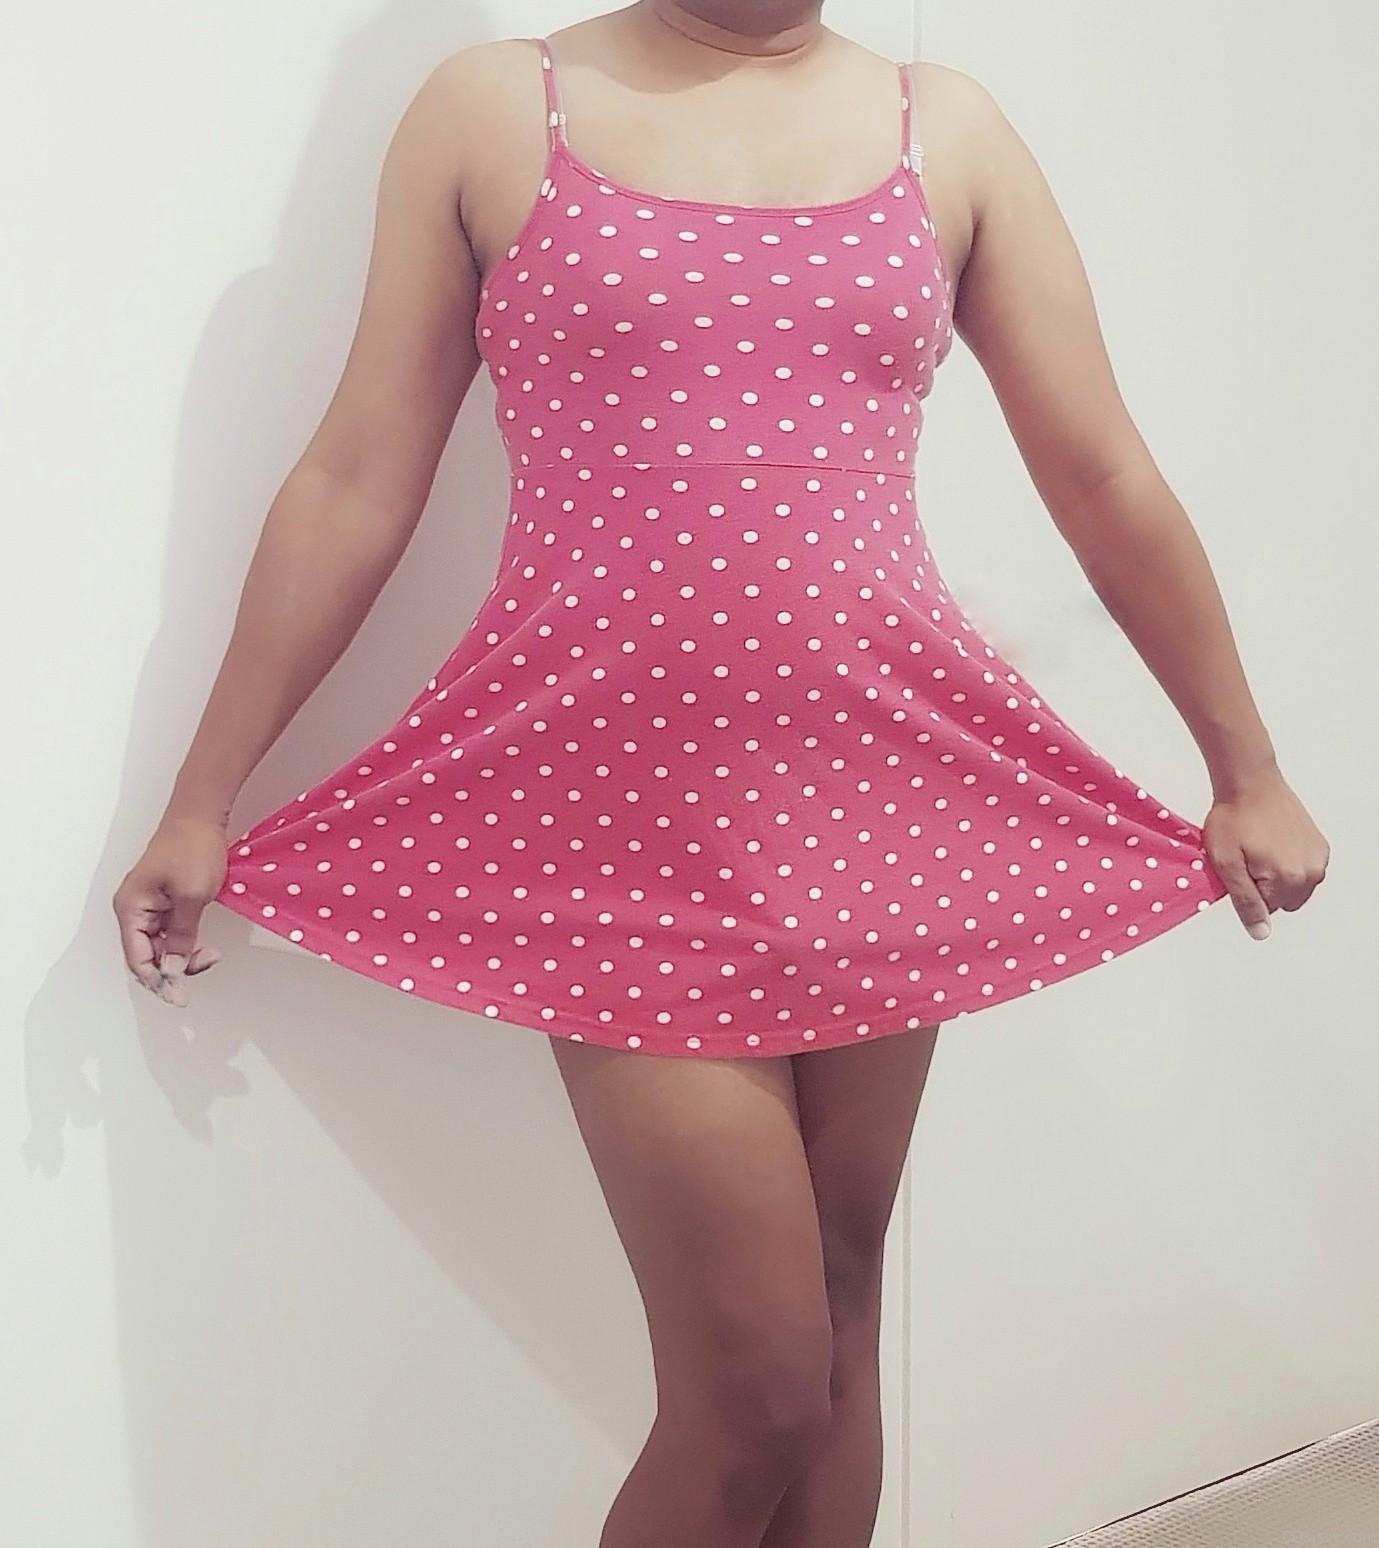 Sissy Fag Anisha